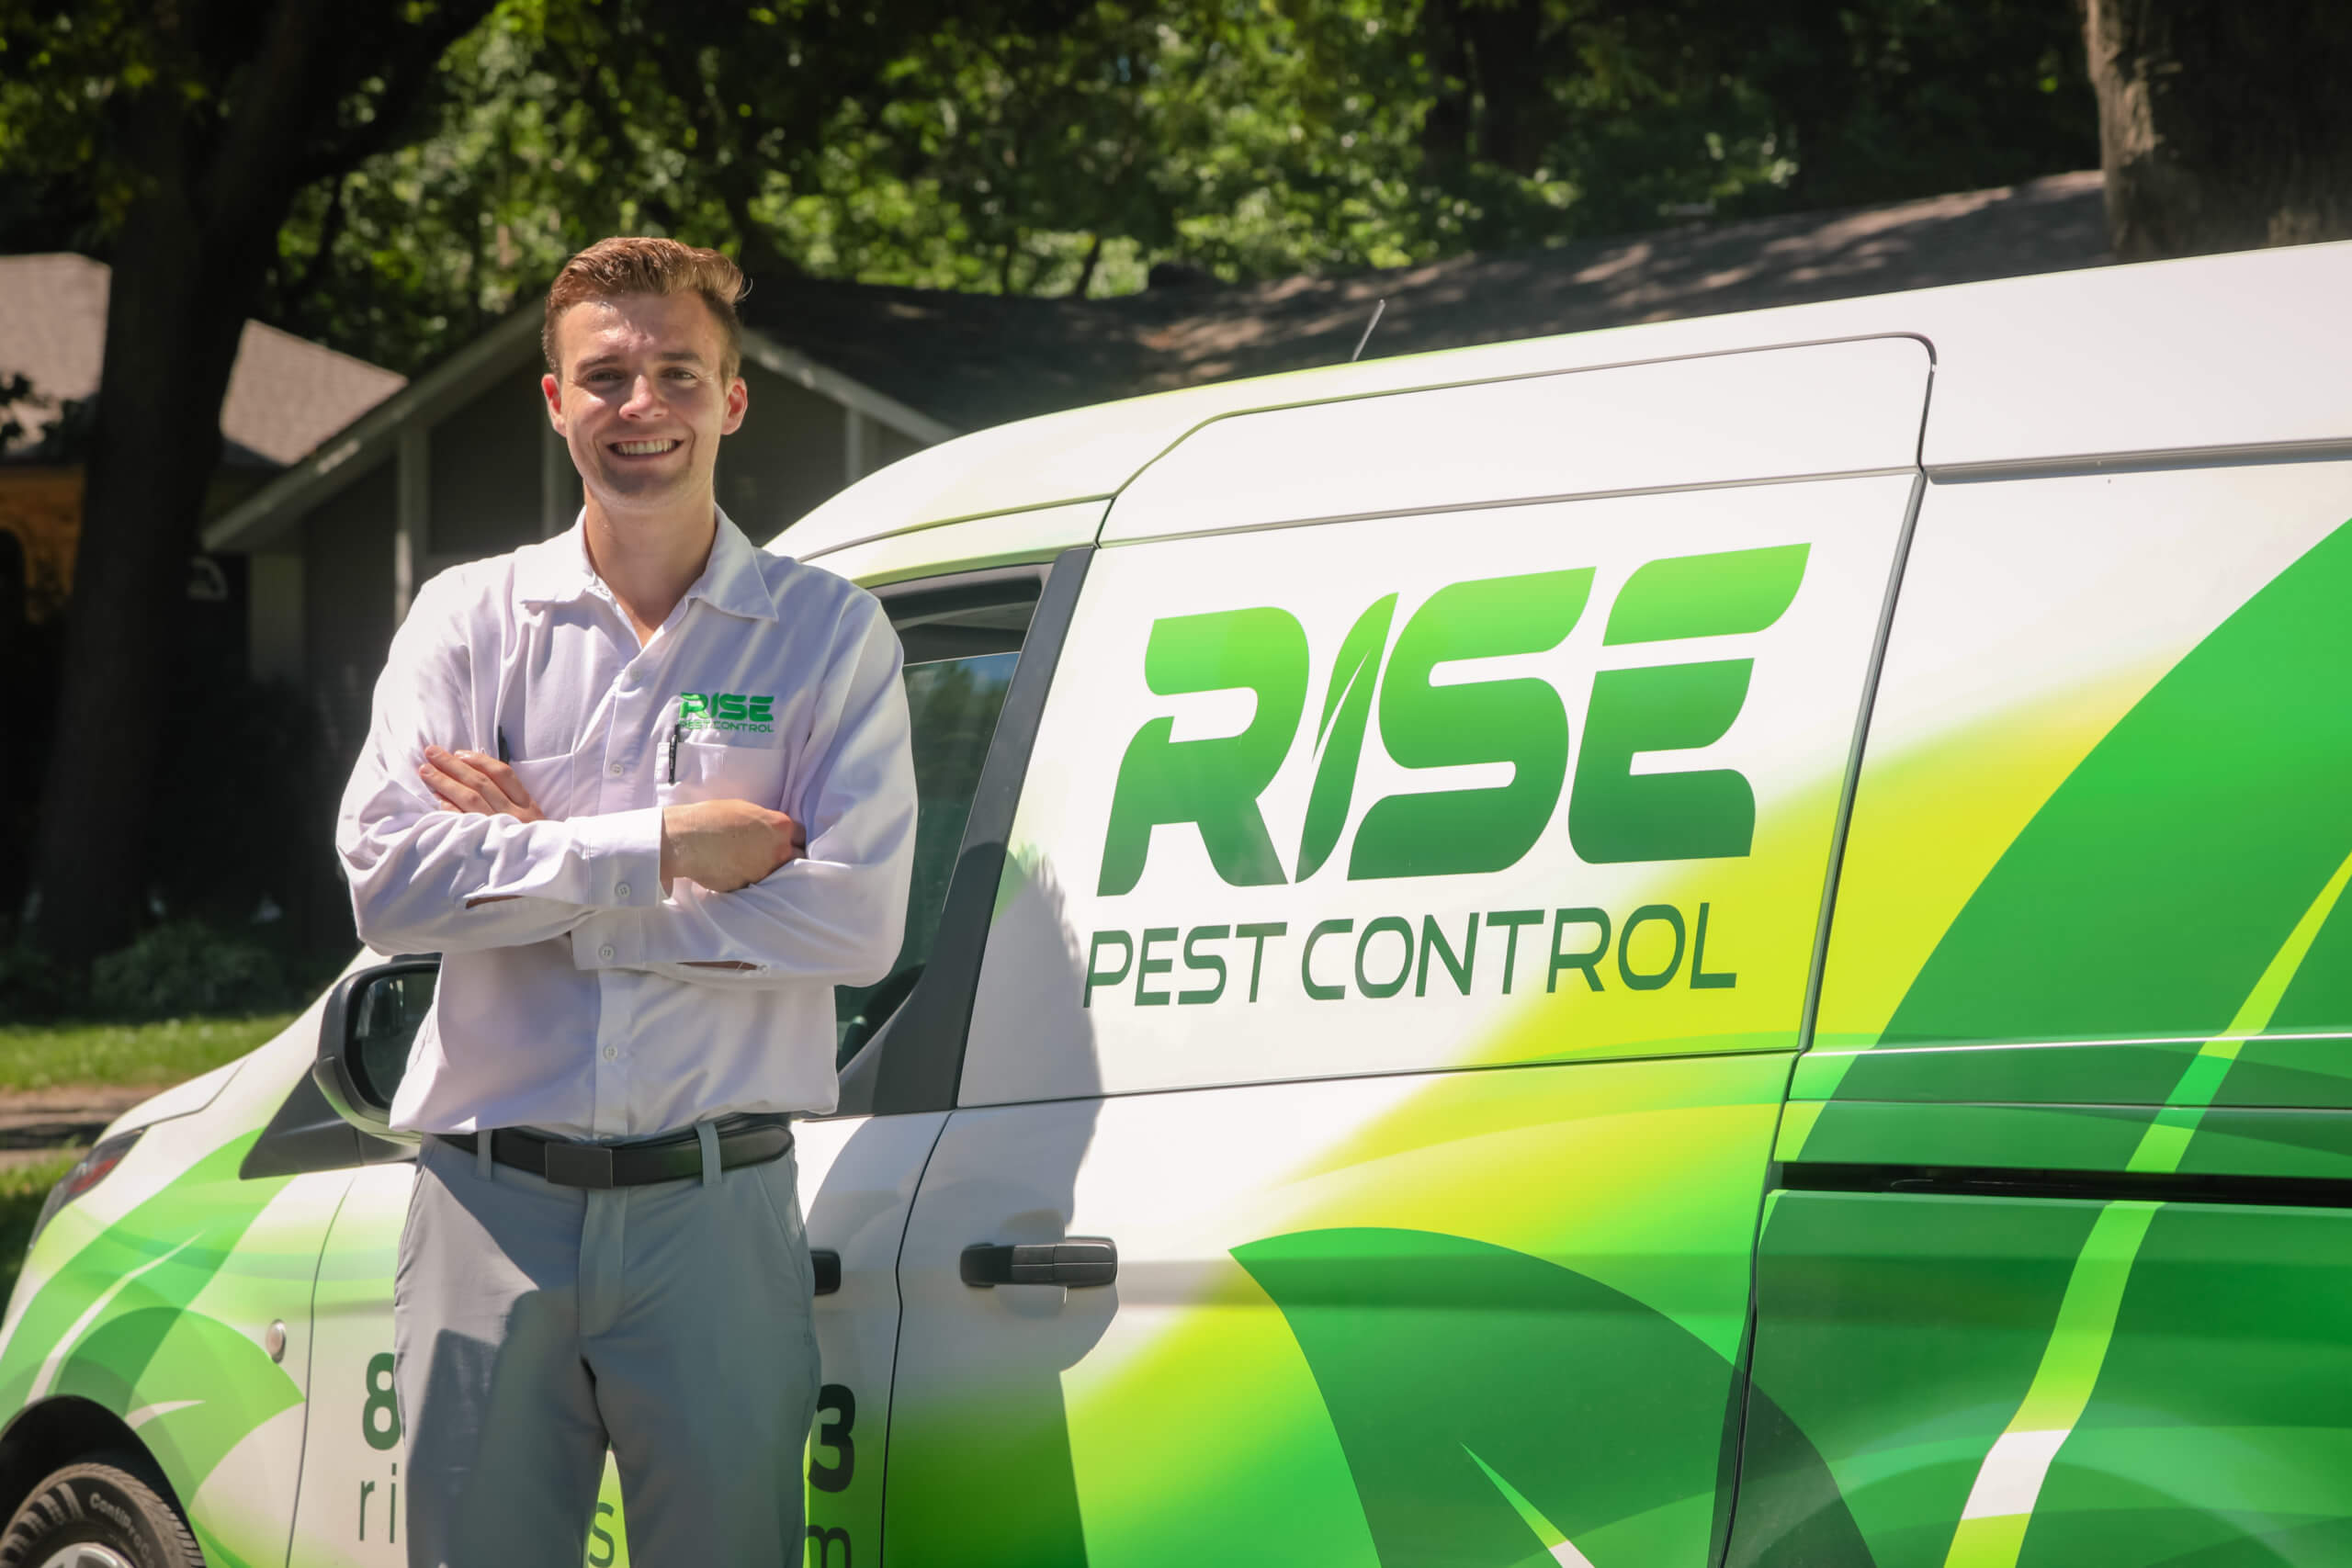 Pest Control Minneapolis: Rise Pest Control Minneapolis Launches a New Website 2